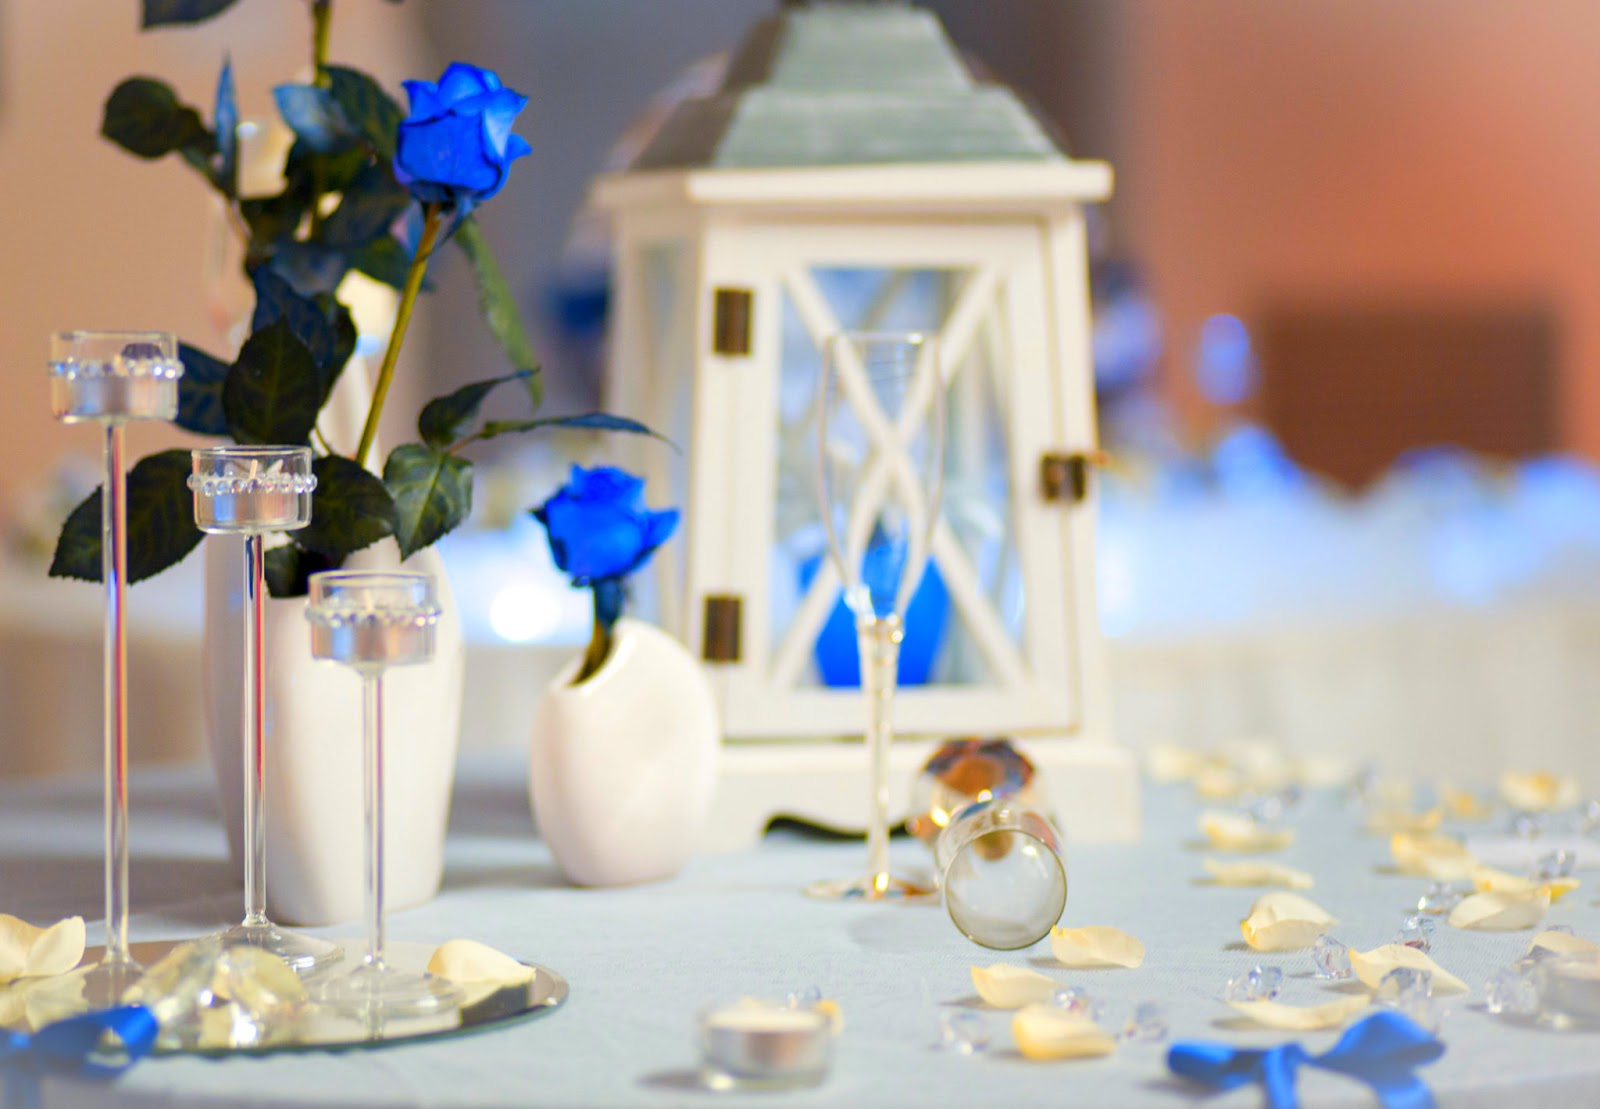 Matrimonio Tema Bianco E Blu : Altri spunti per matrimonio bianco e blu wedding